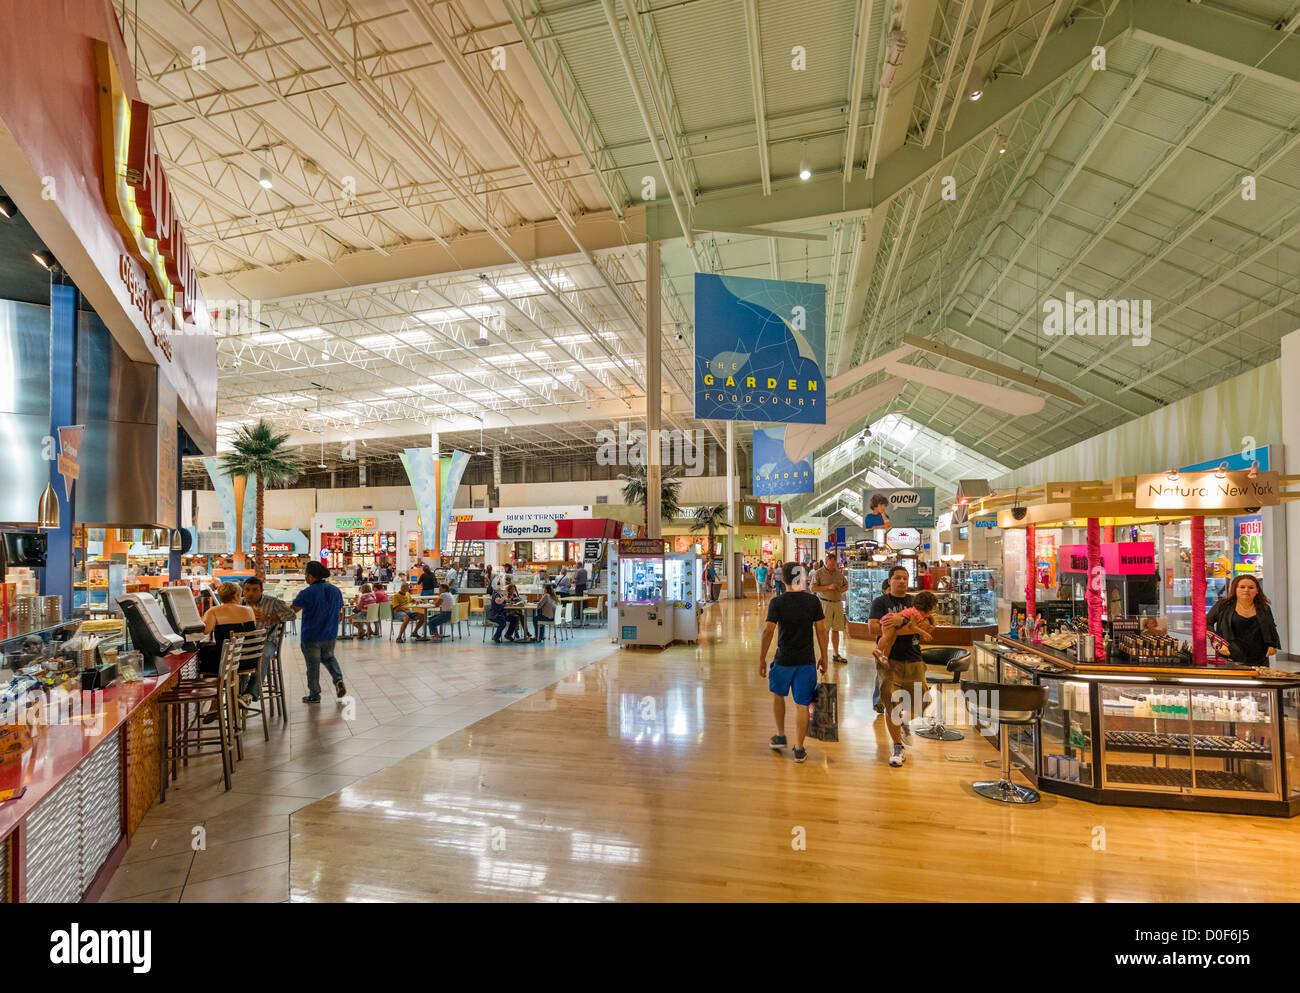 Food-Court in der Sawgrass Mills Shopping-Mall, Sonnenaufgang, Broward County, Florida, USA Stockbild